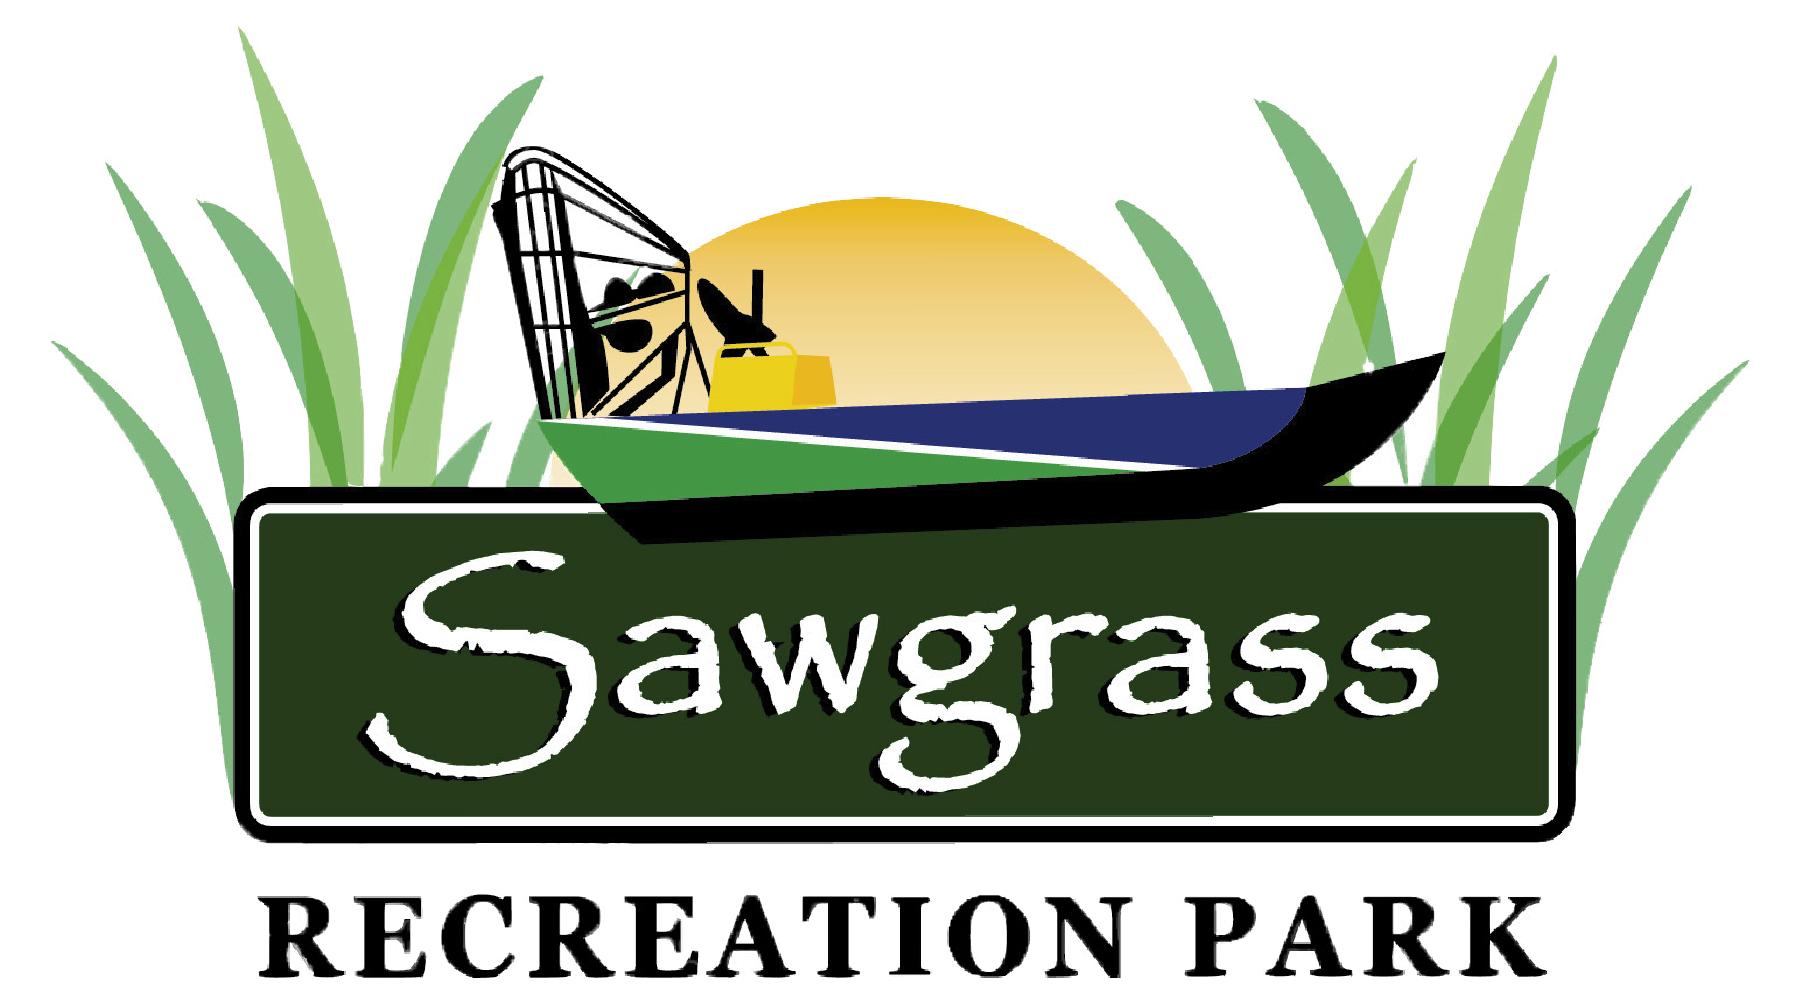 Sawgrass park adventure pass